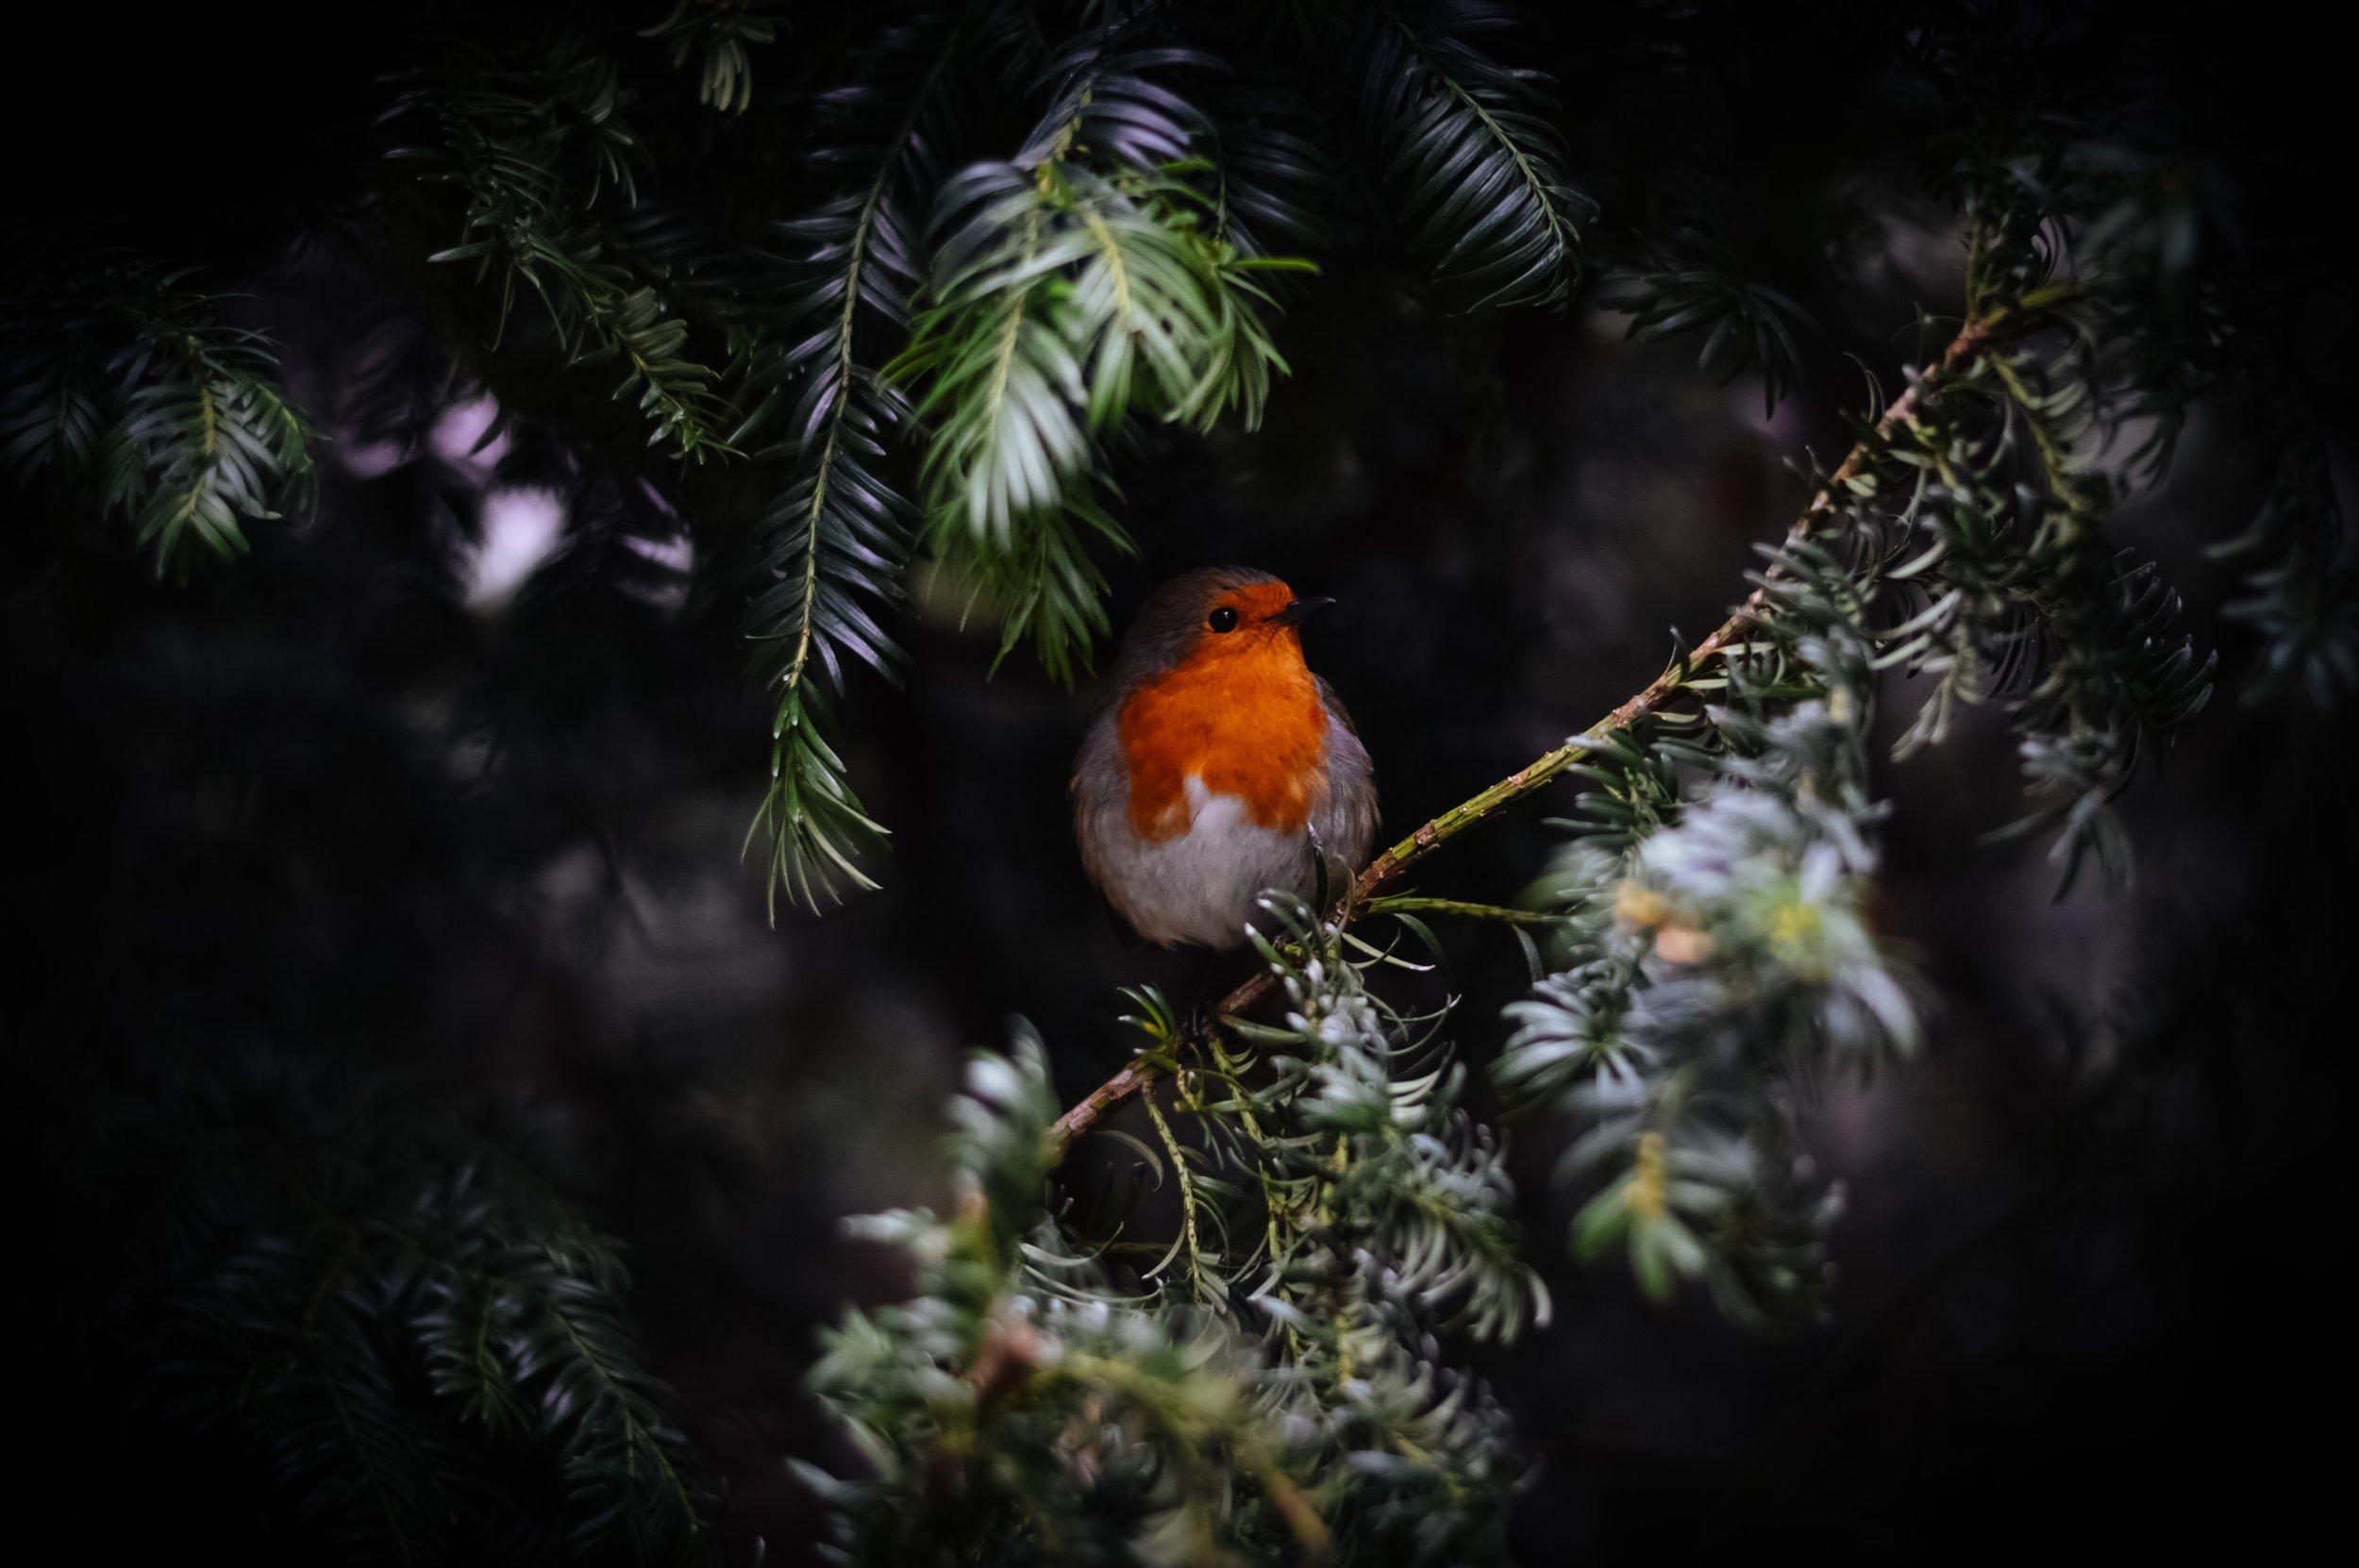 Robin bird in pinetree biel morro Up cW.jpg